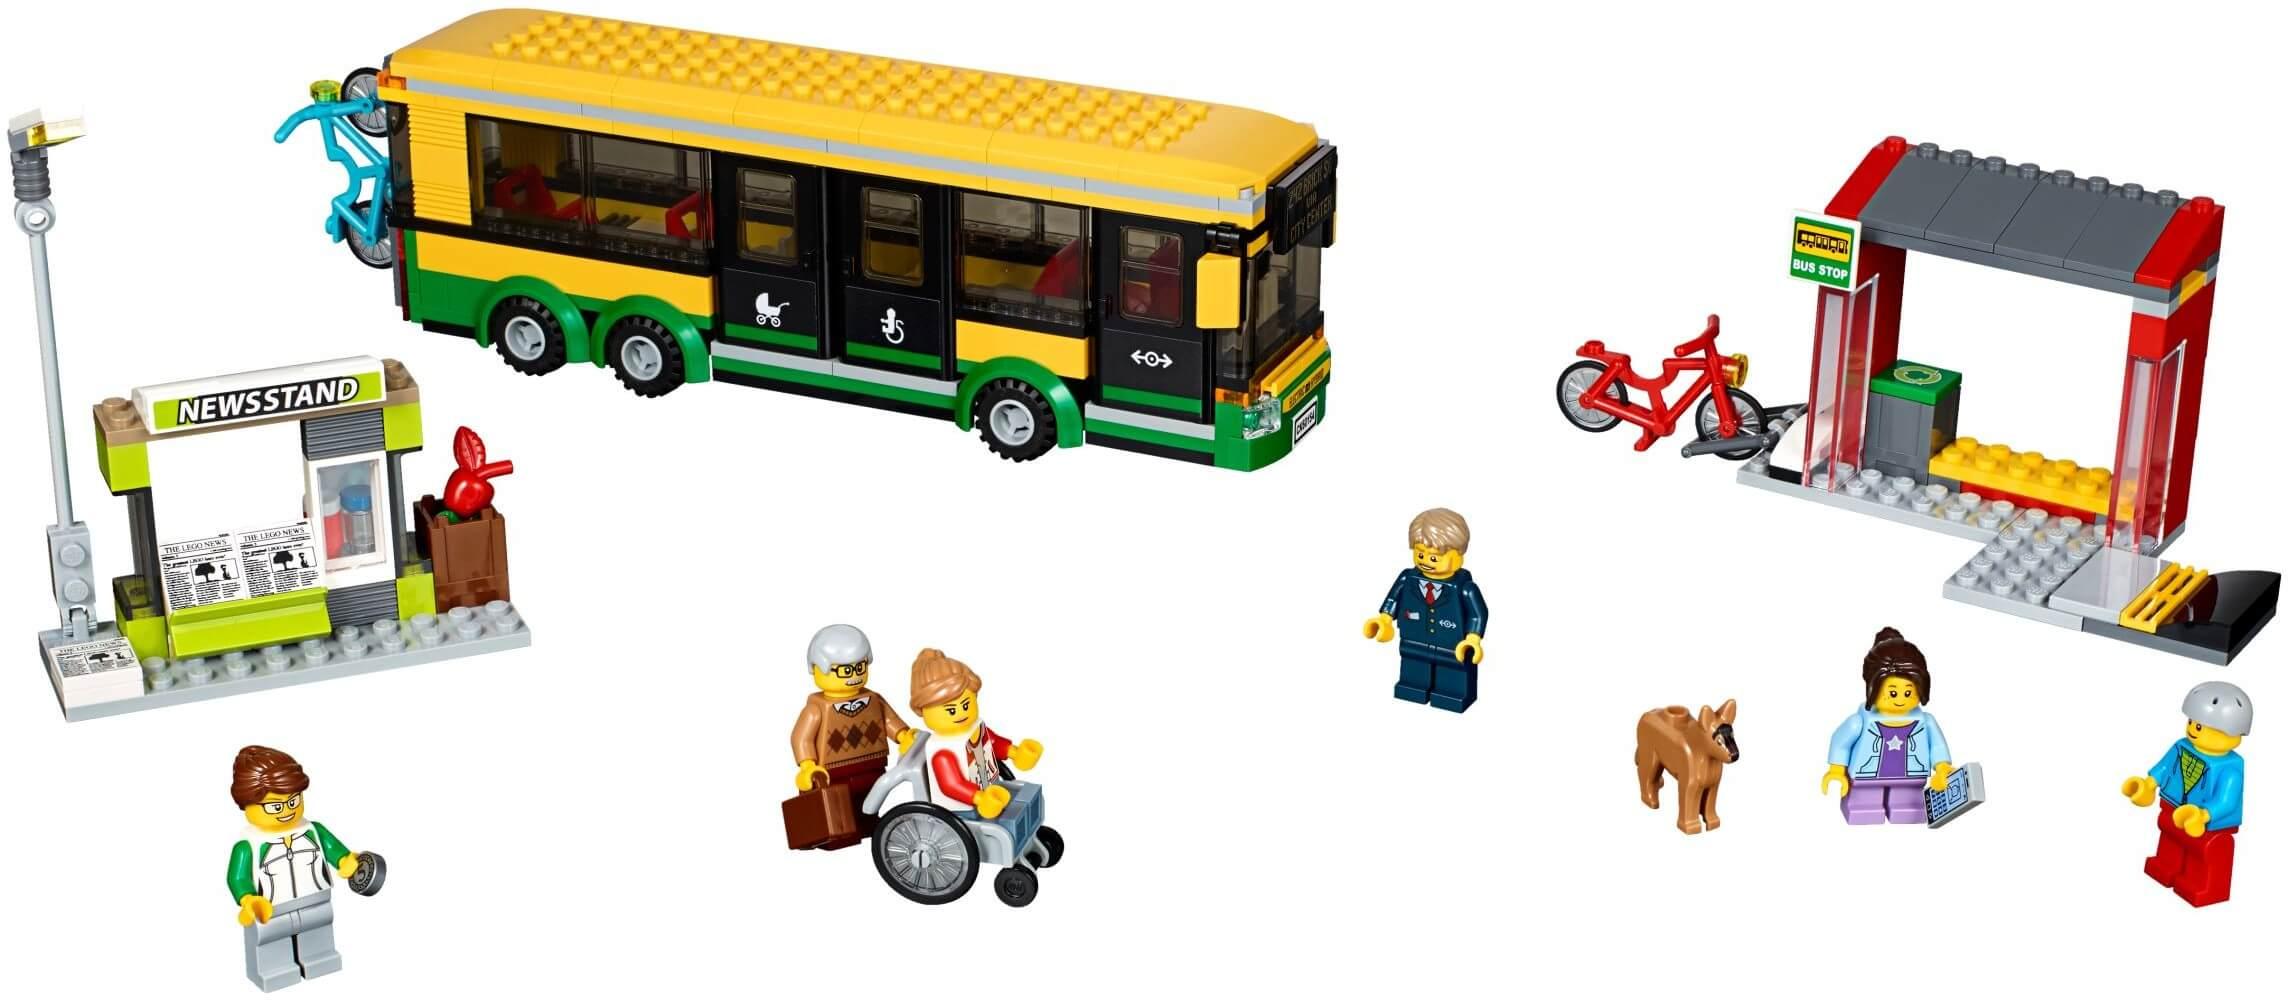 Mua đồ chơi LEGO 60154 - LEGO City 60154 - Trạm Xe Buýt (LEGO City Town Bus Station)